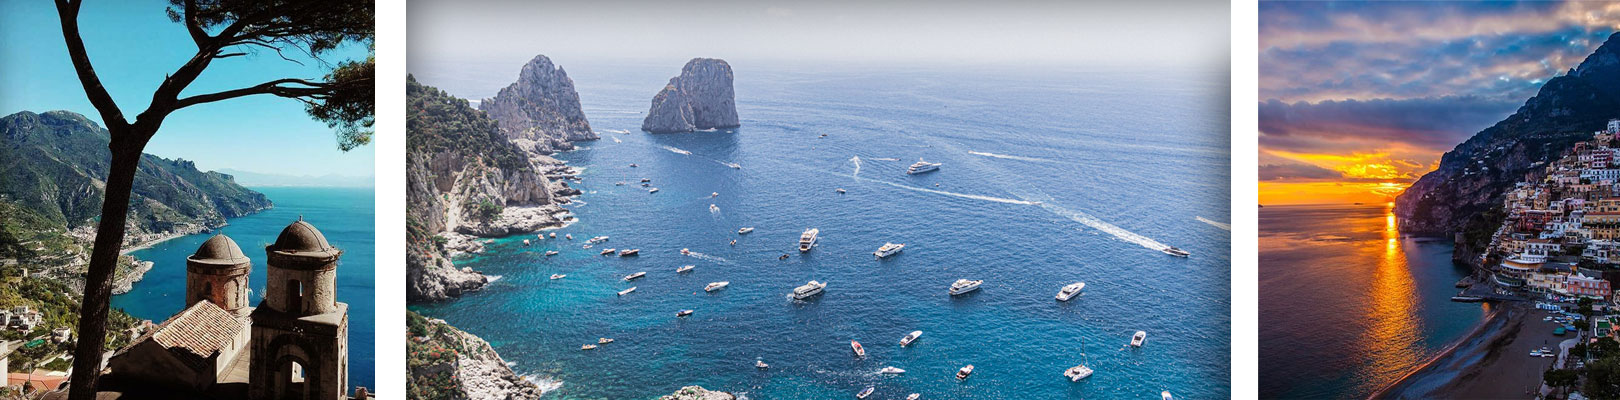 Capri-e-la-Costiera-Amalfitana-una-panoramica-online